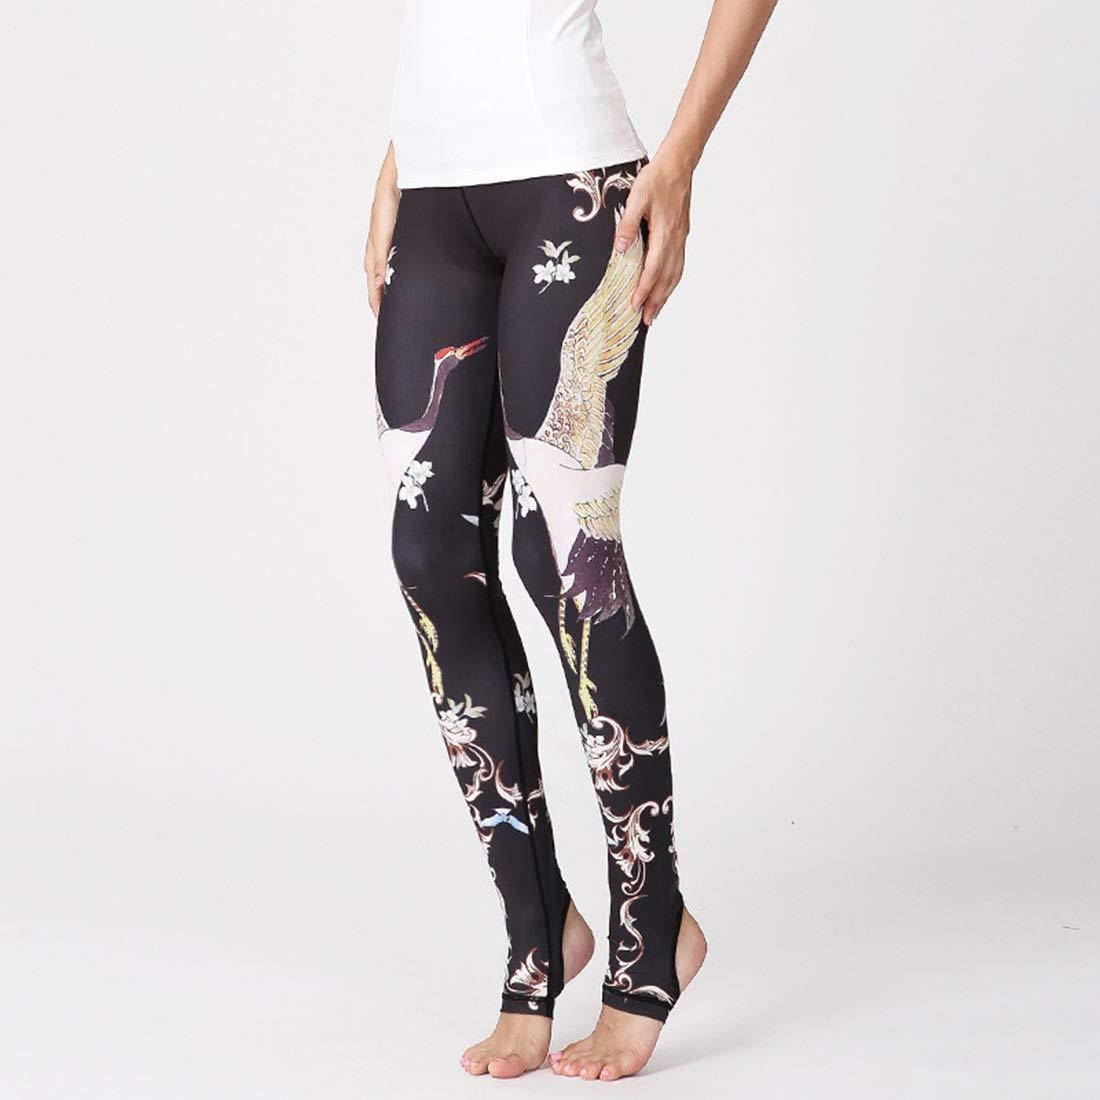 A003 Huayue Yoga Pants Women's Printed Elastic Slimming Fitness Riggoldus Pants